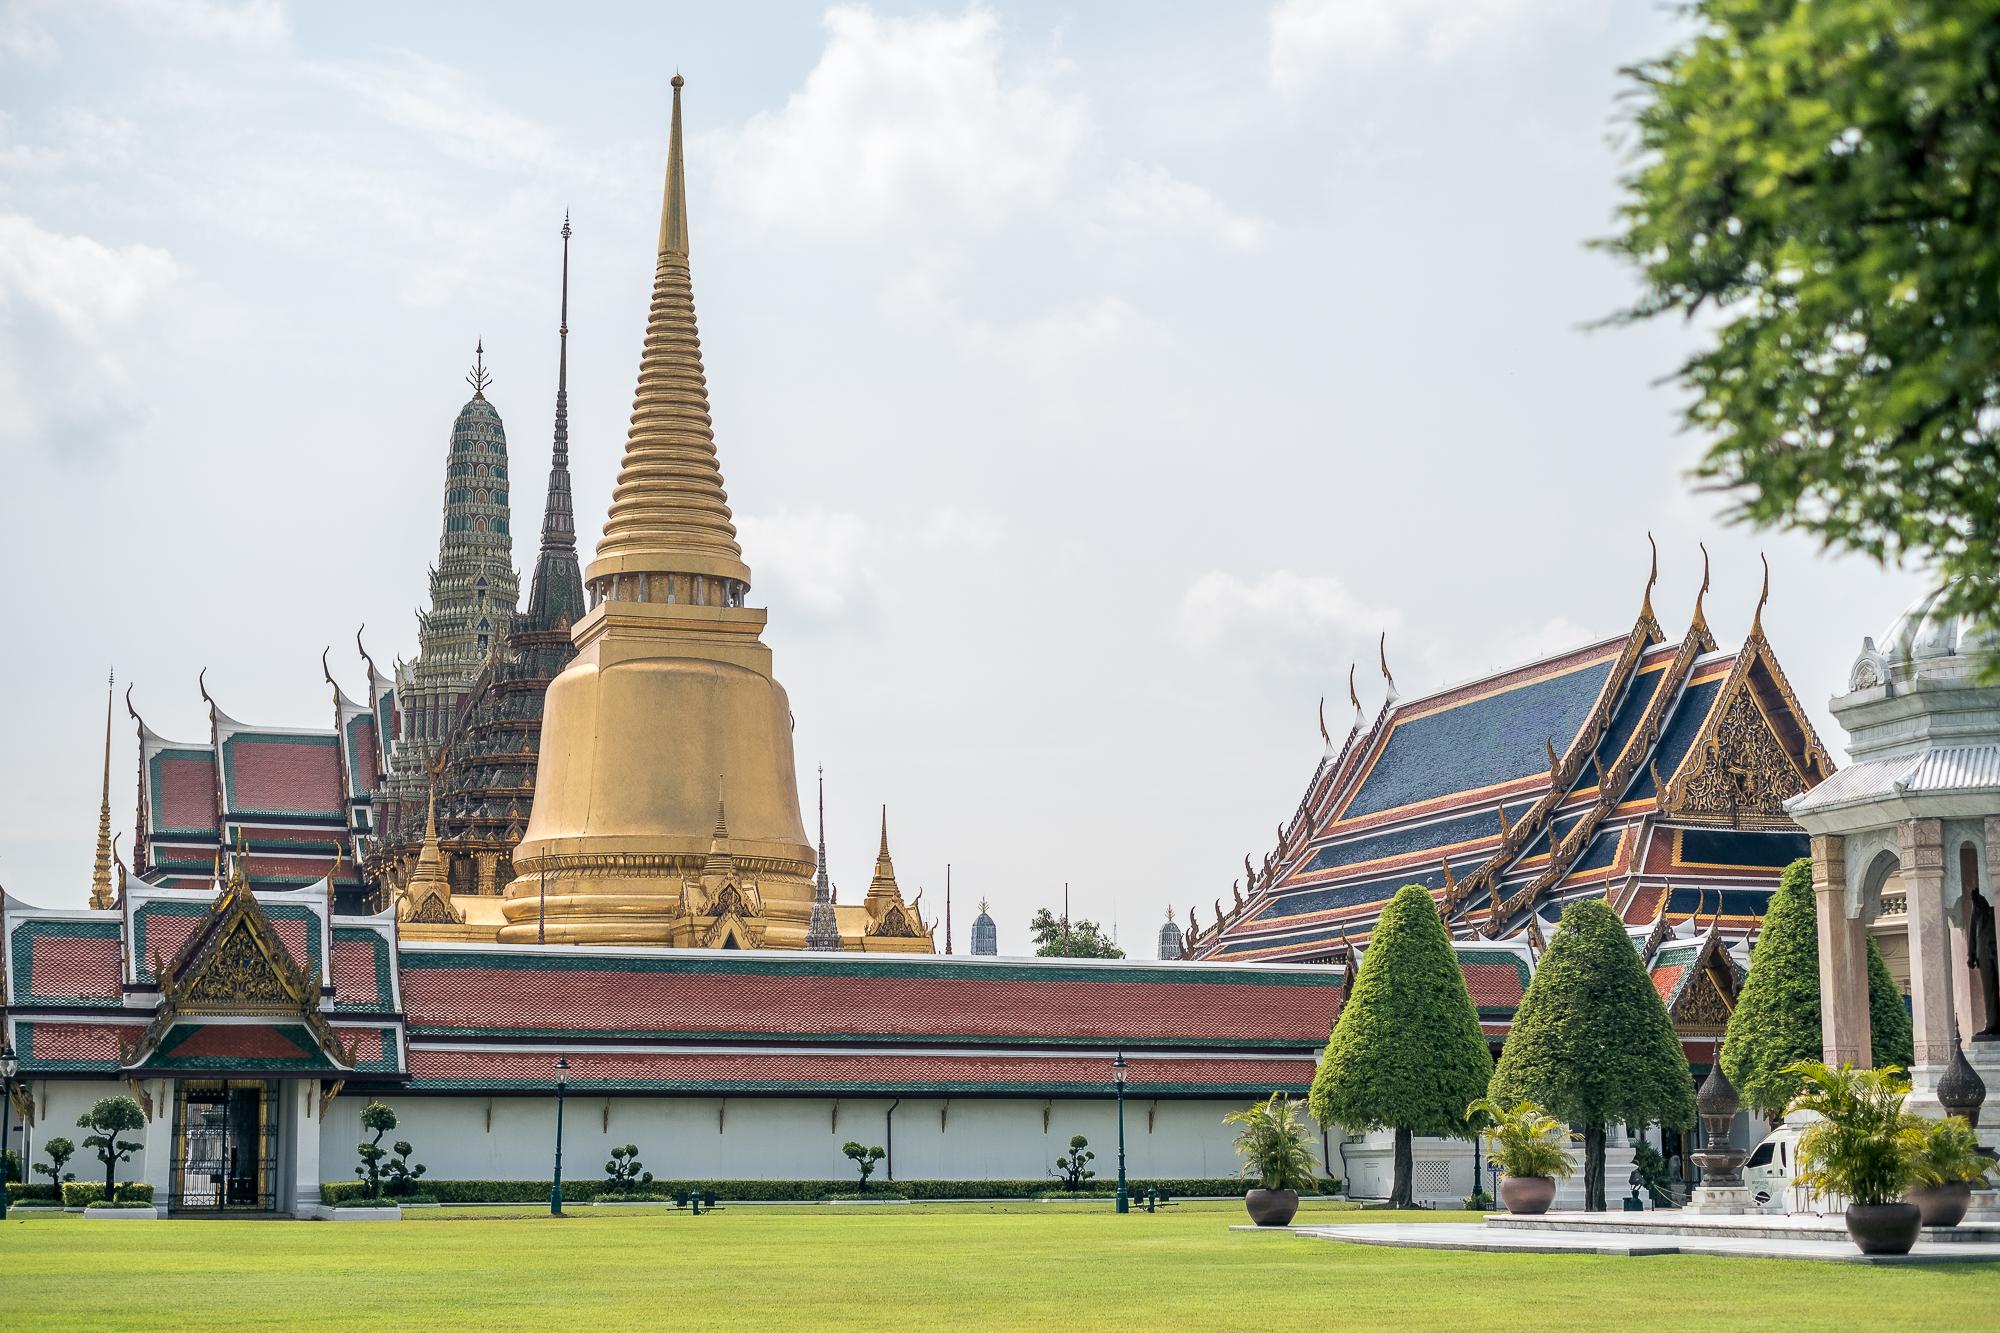 THAILAND_Honeymoon_TheOutsiderBlog_DSCF0108.JPG